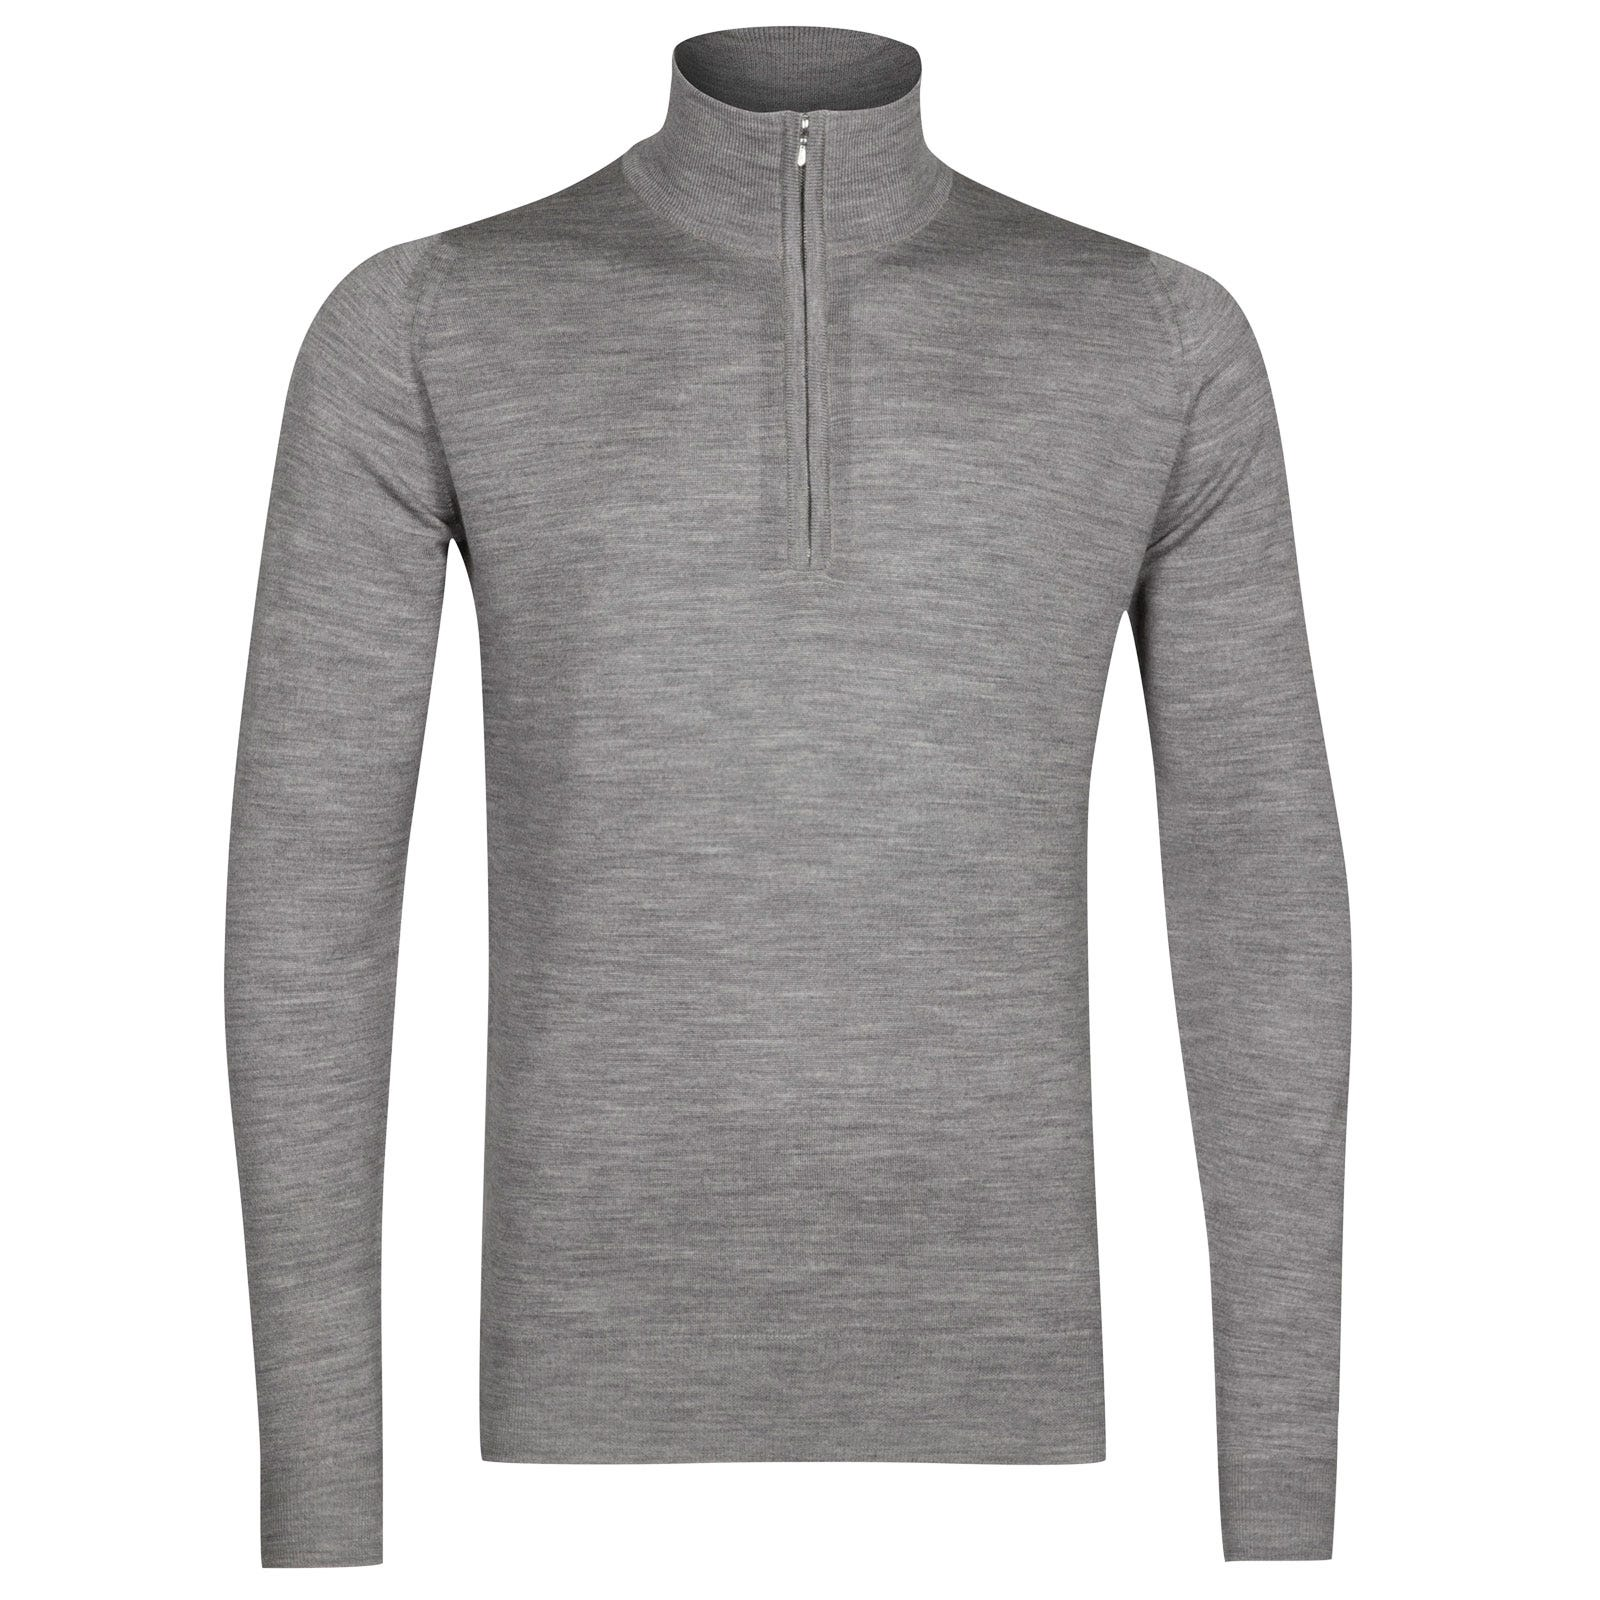 John Smedley Barrow Merino Wool Pullover in Silver-S